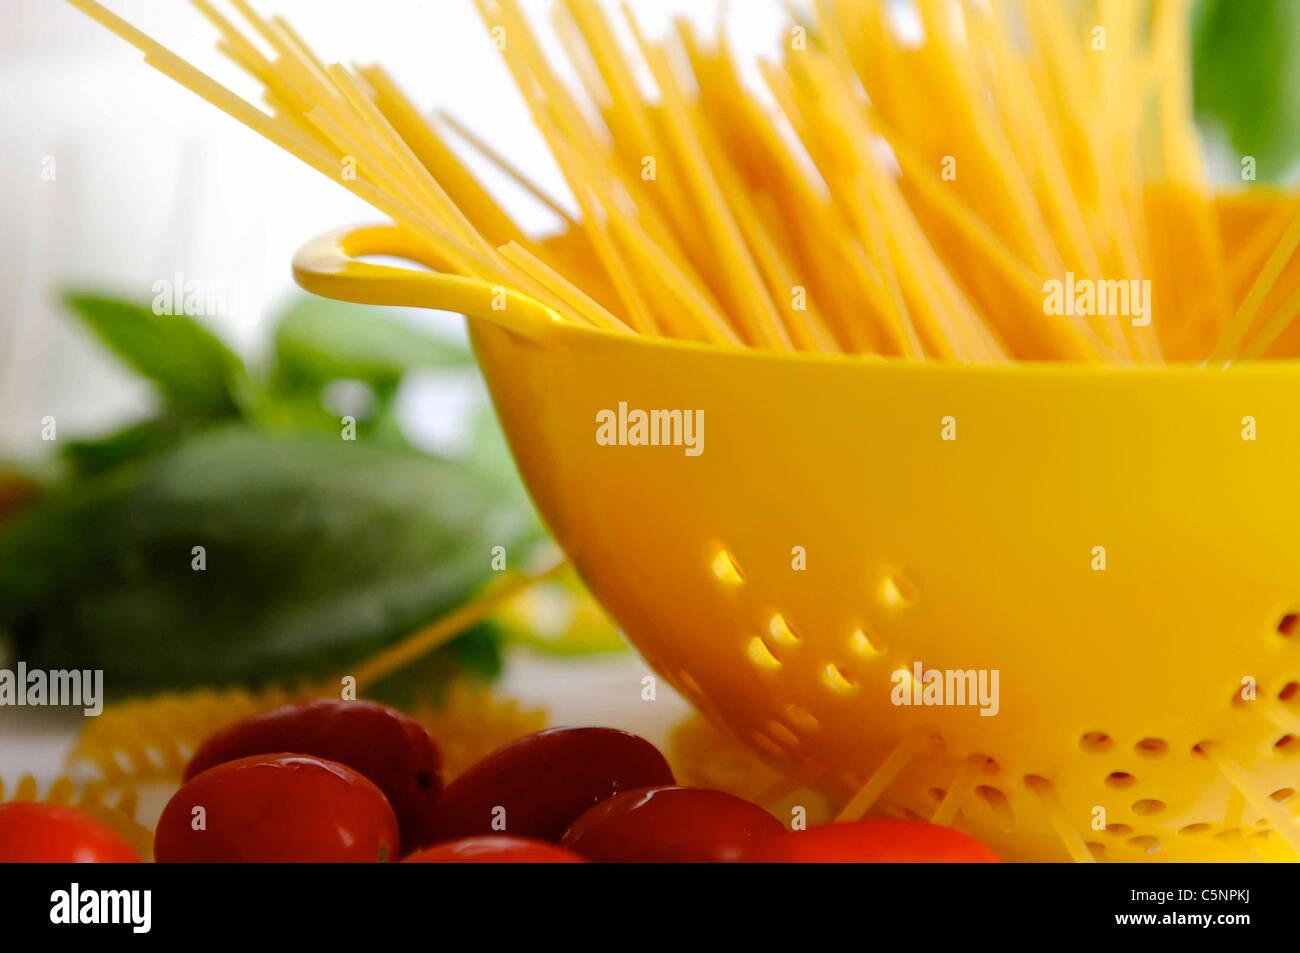 Raw spaghetti in a yellow colander - Stock Image